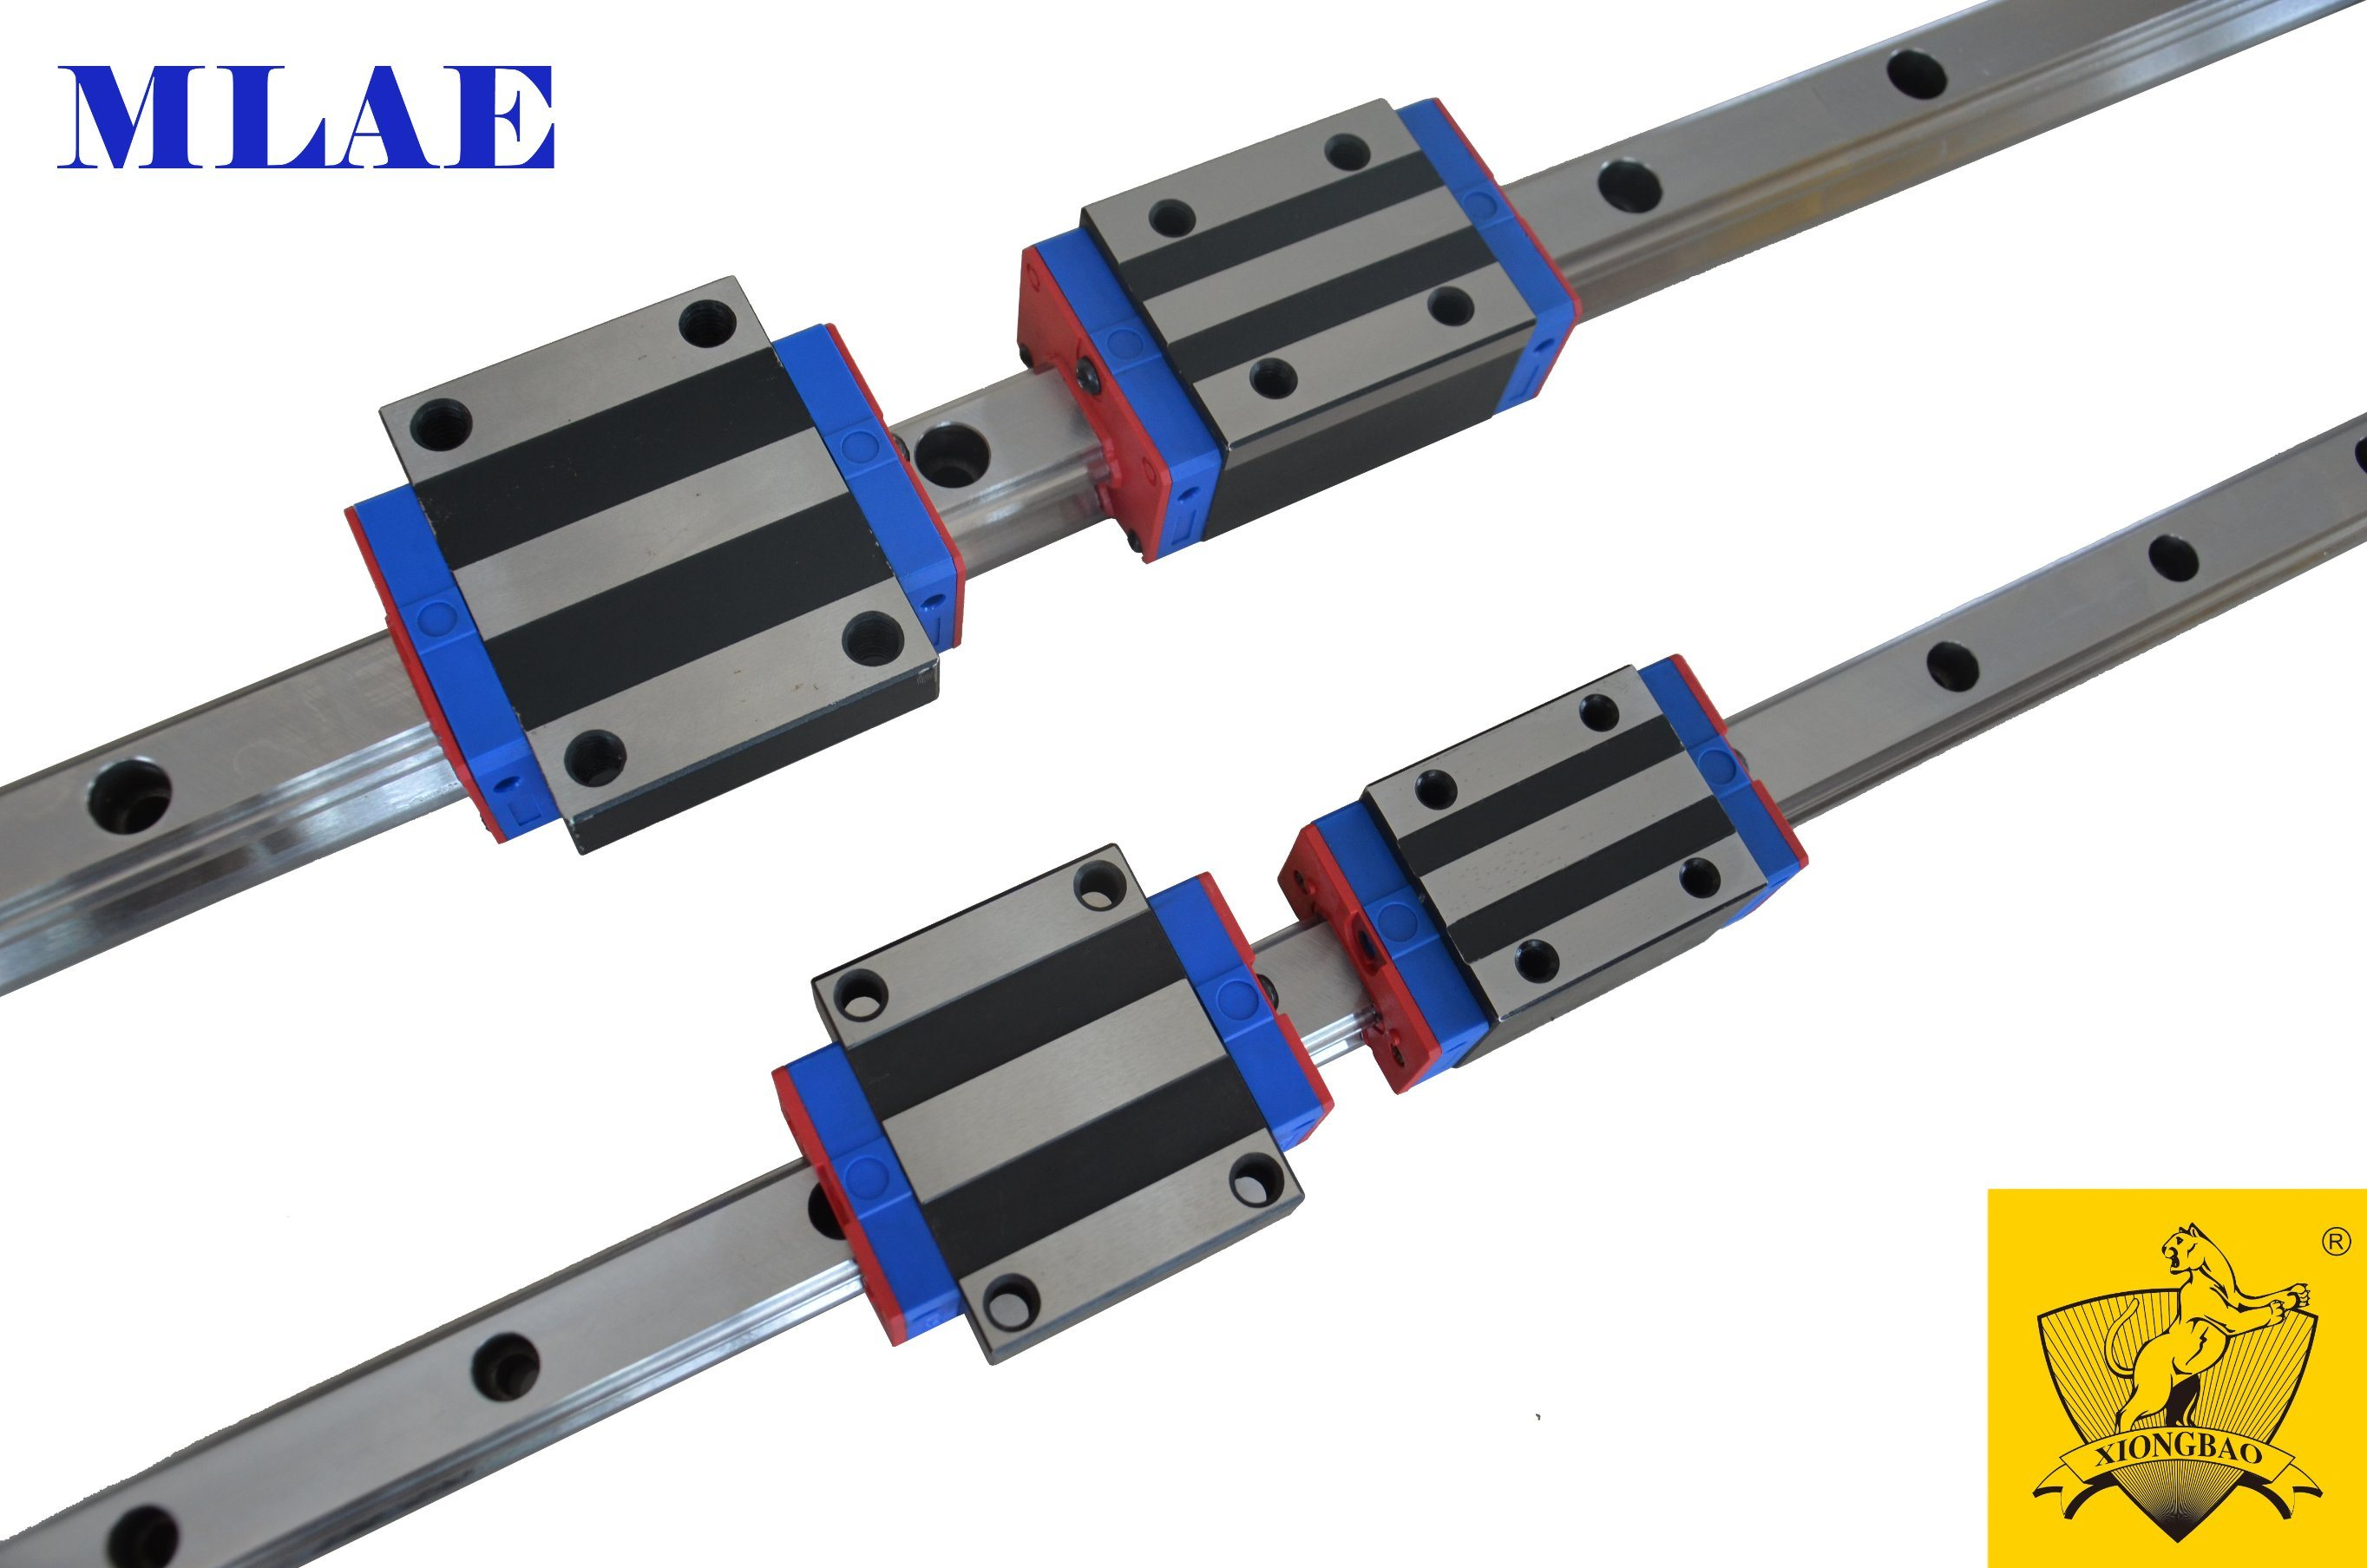 Mlae Xbd Frange Block for Rotimatic Machine